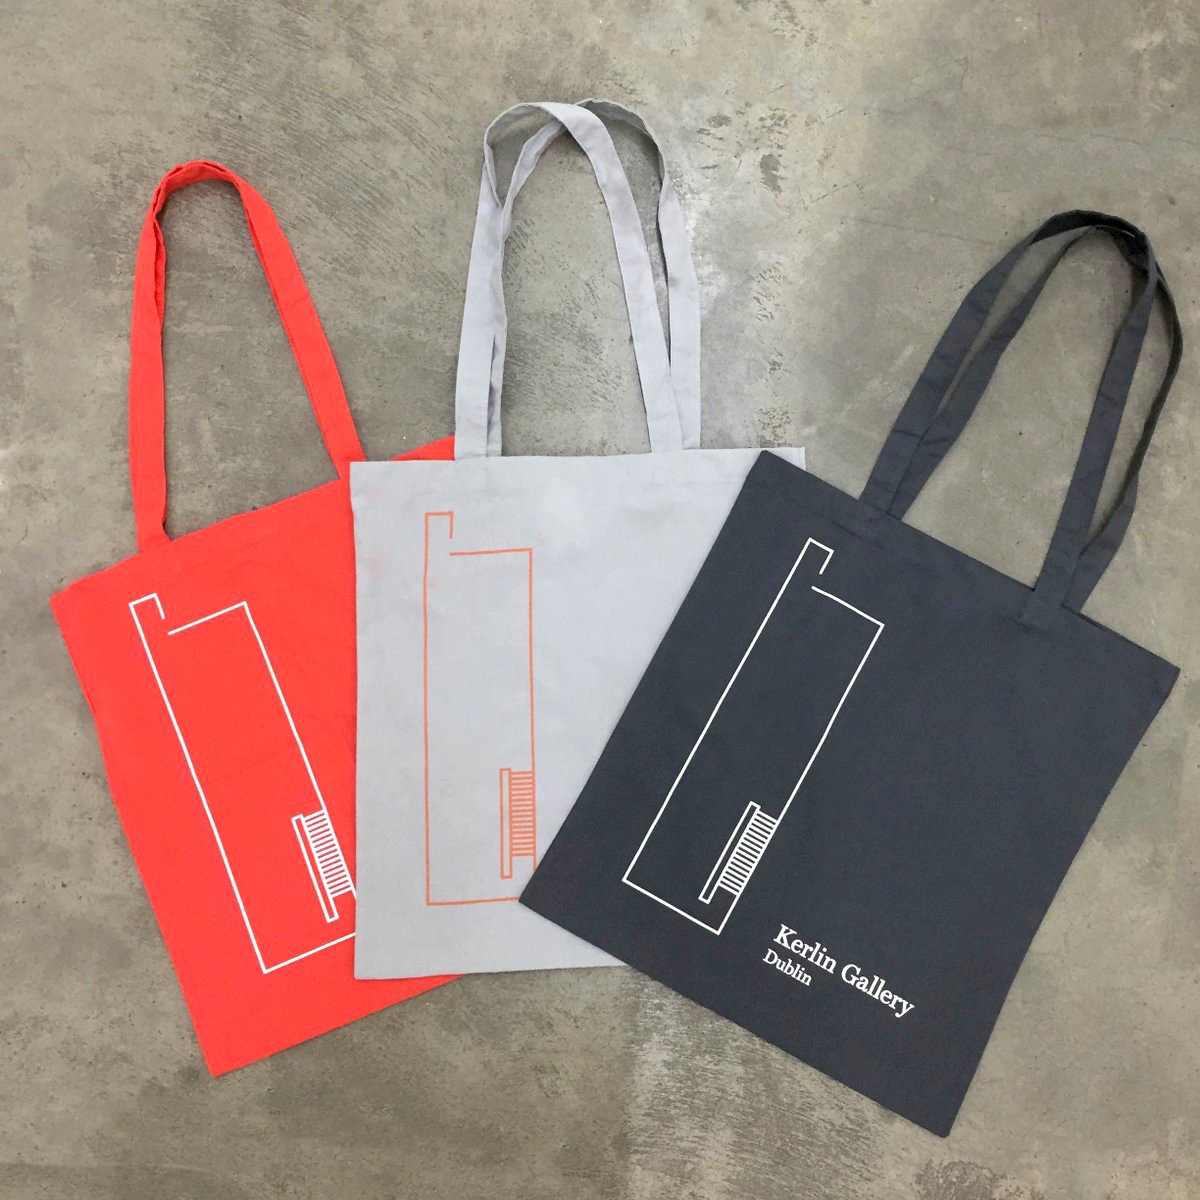 Cover image: Kerlin Gallery Tote Bag